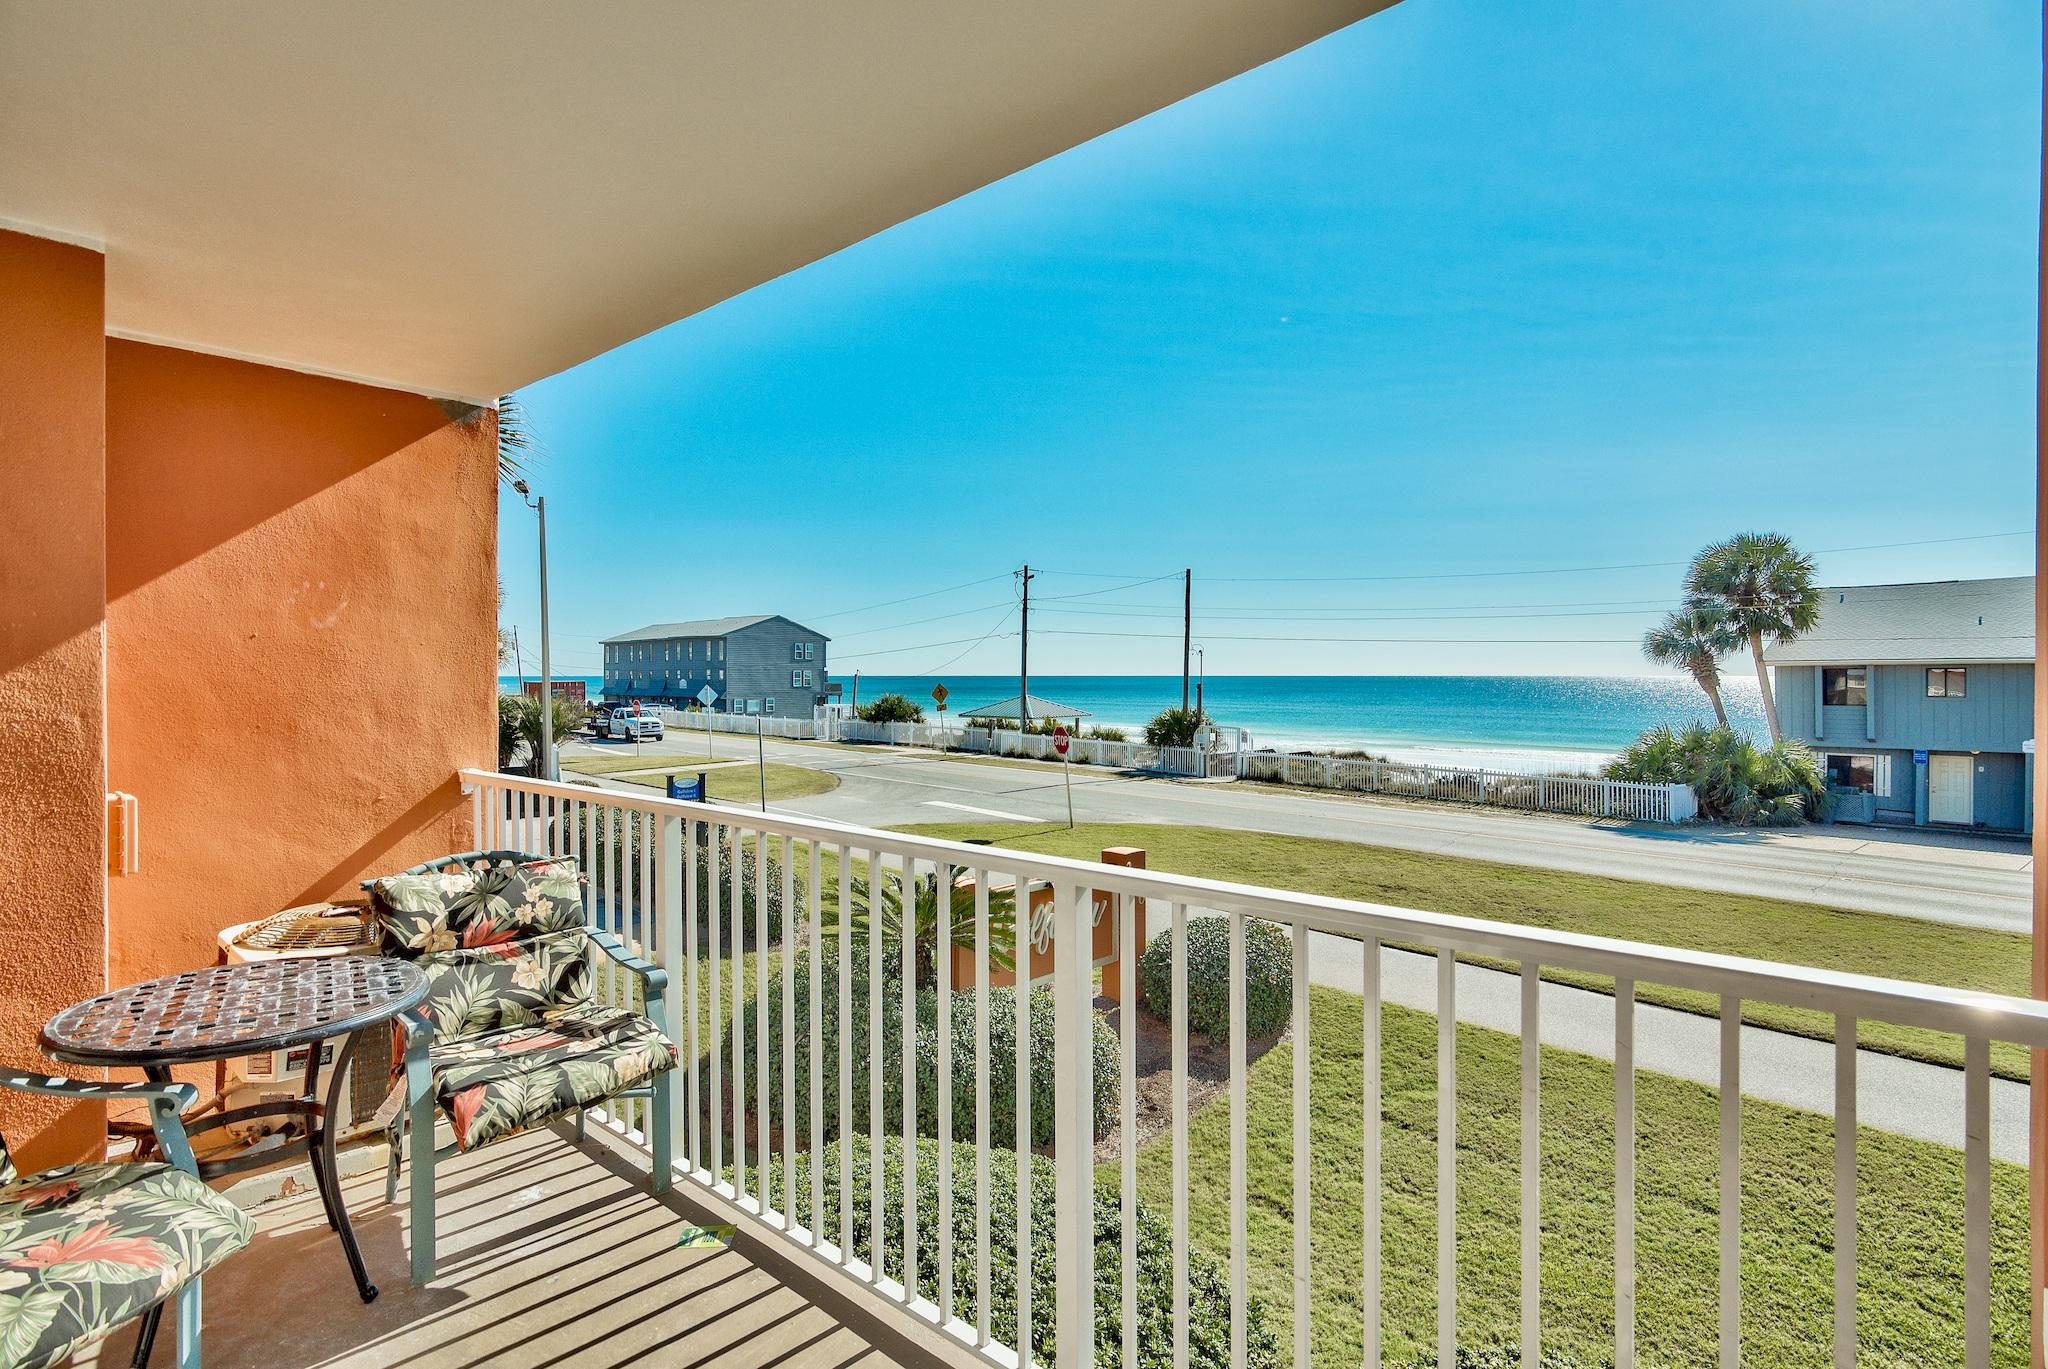 Gulfview 213 1 Bed Destin Beach Condo Rentals Destin